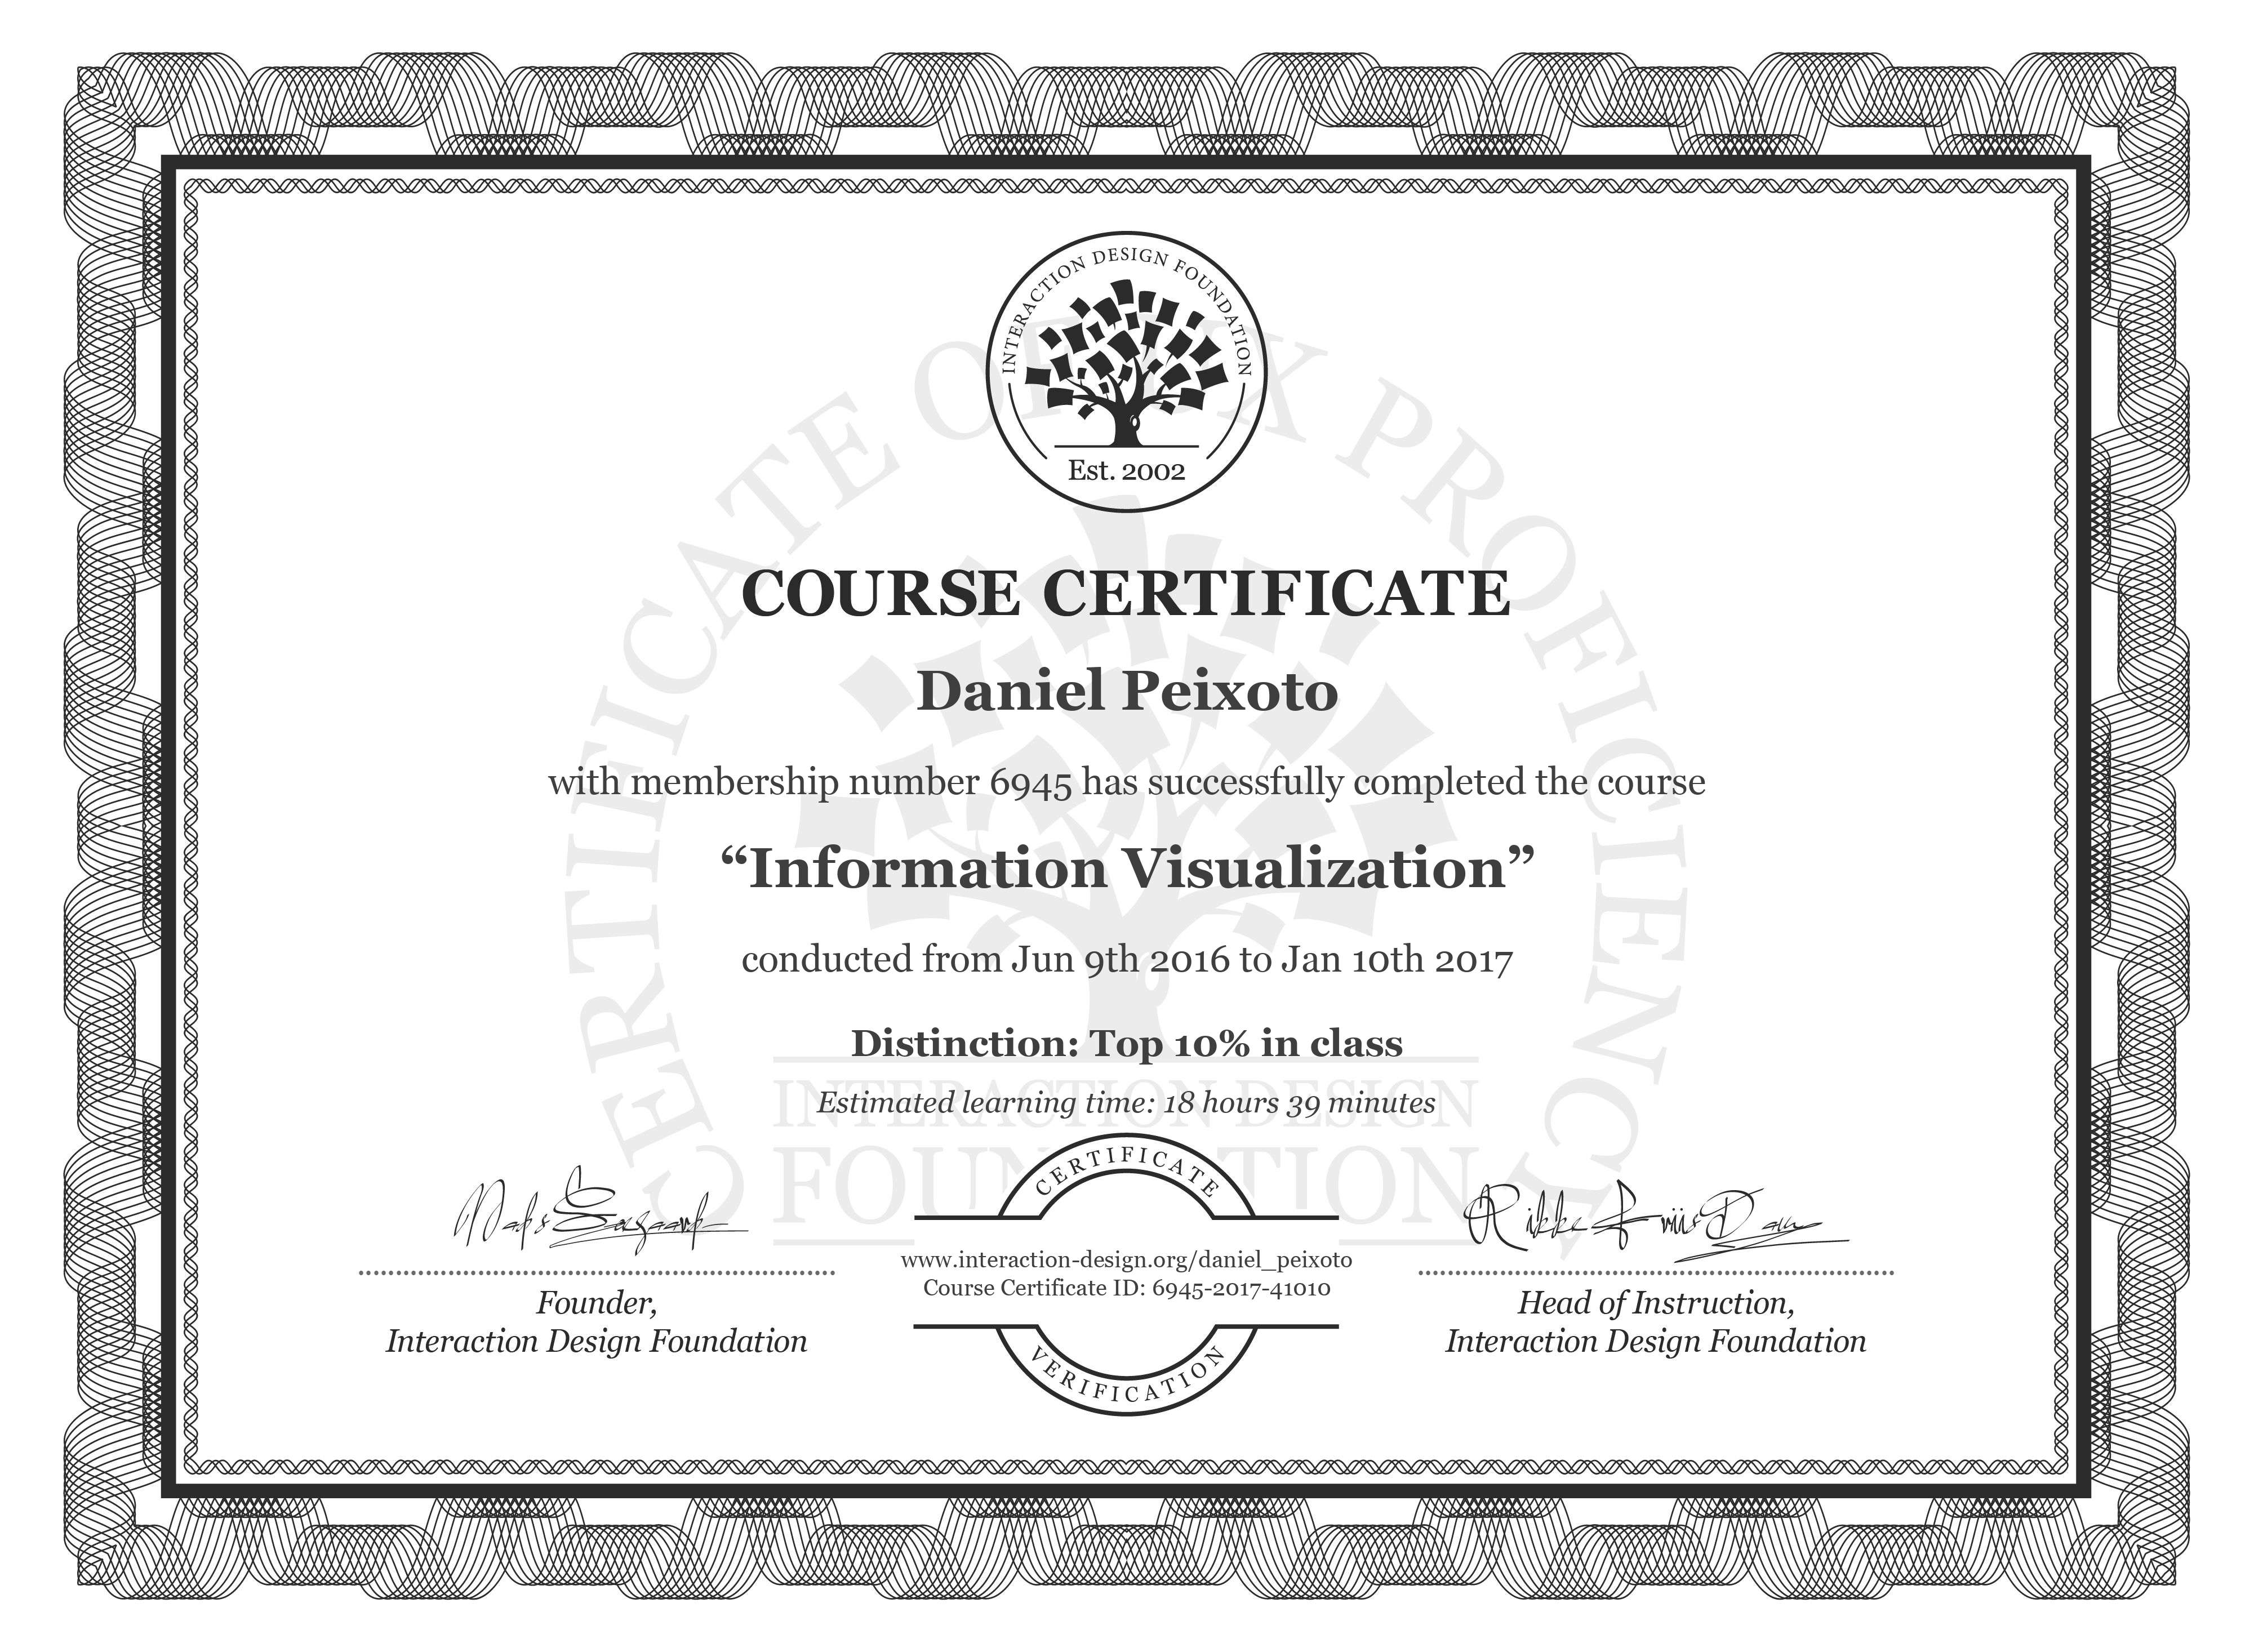 Daniel Peixoto: Course Certificate - Information Visualization